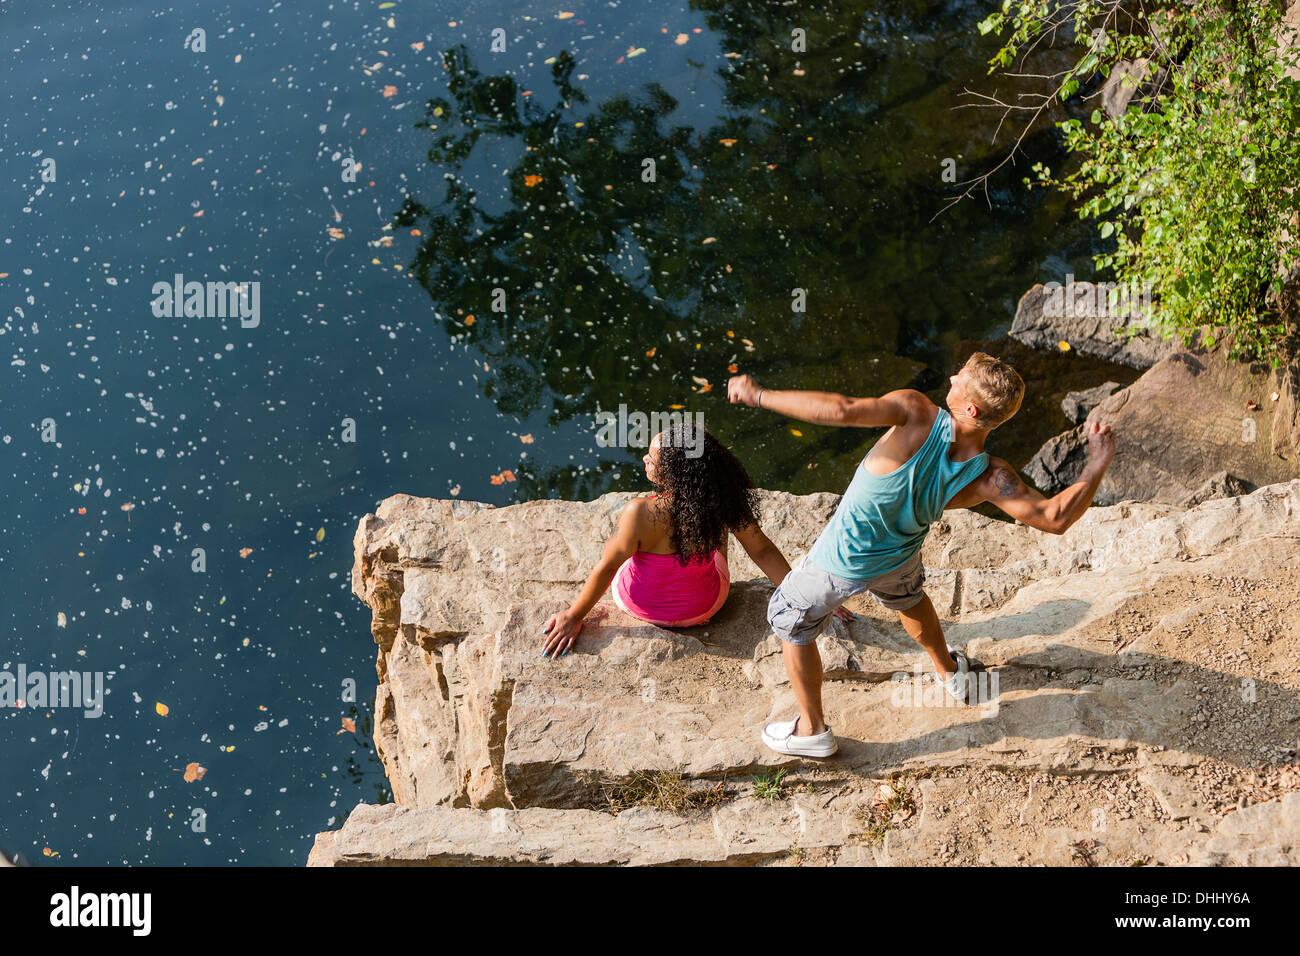 Pareja joven arrojando piedras desde rock ledge, Hamburgo, Pennsylvania, EE.UU. Foto de stock